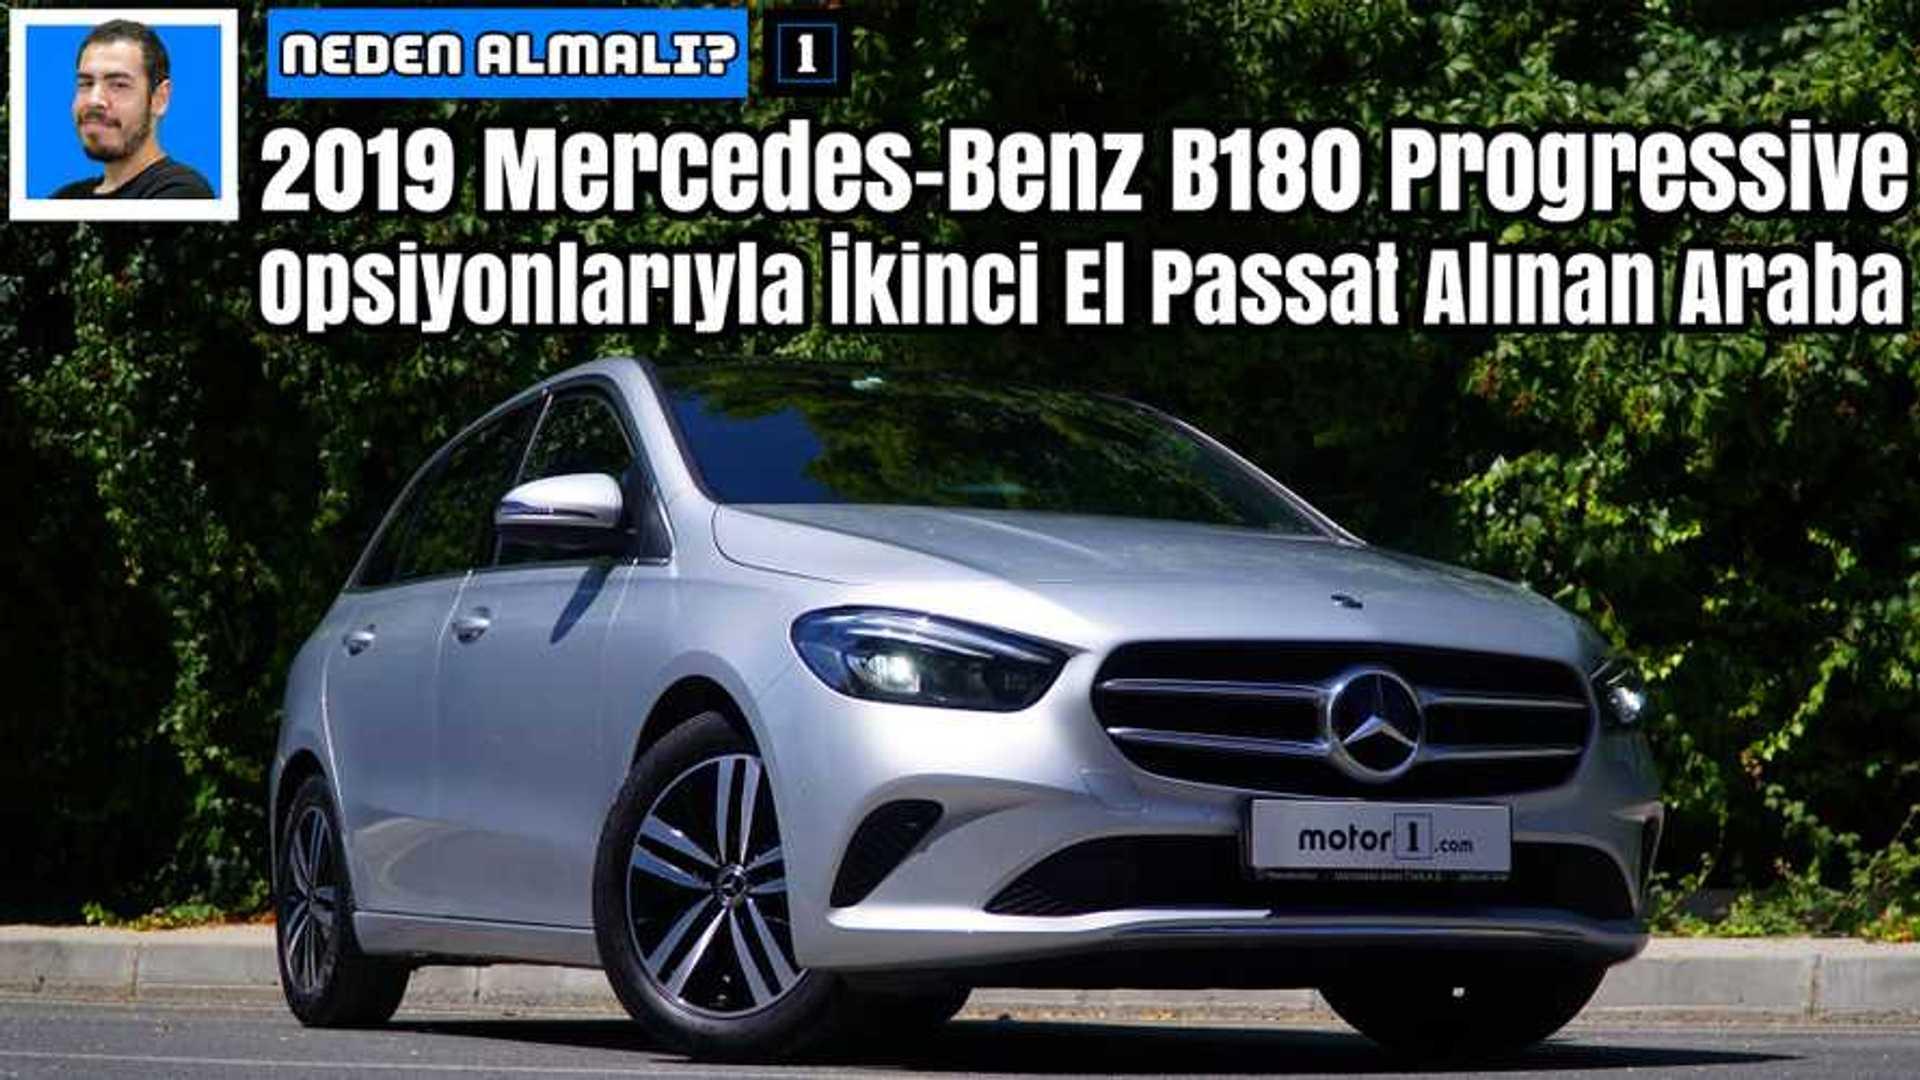 2019 Mercedes-Benz B180 Progressive   Neden Almalı ?